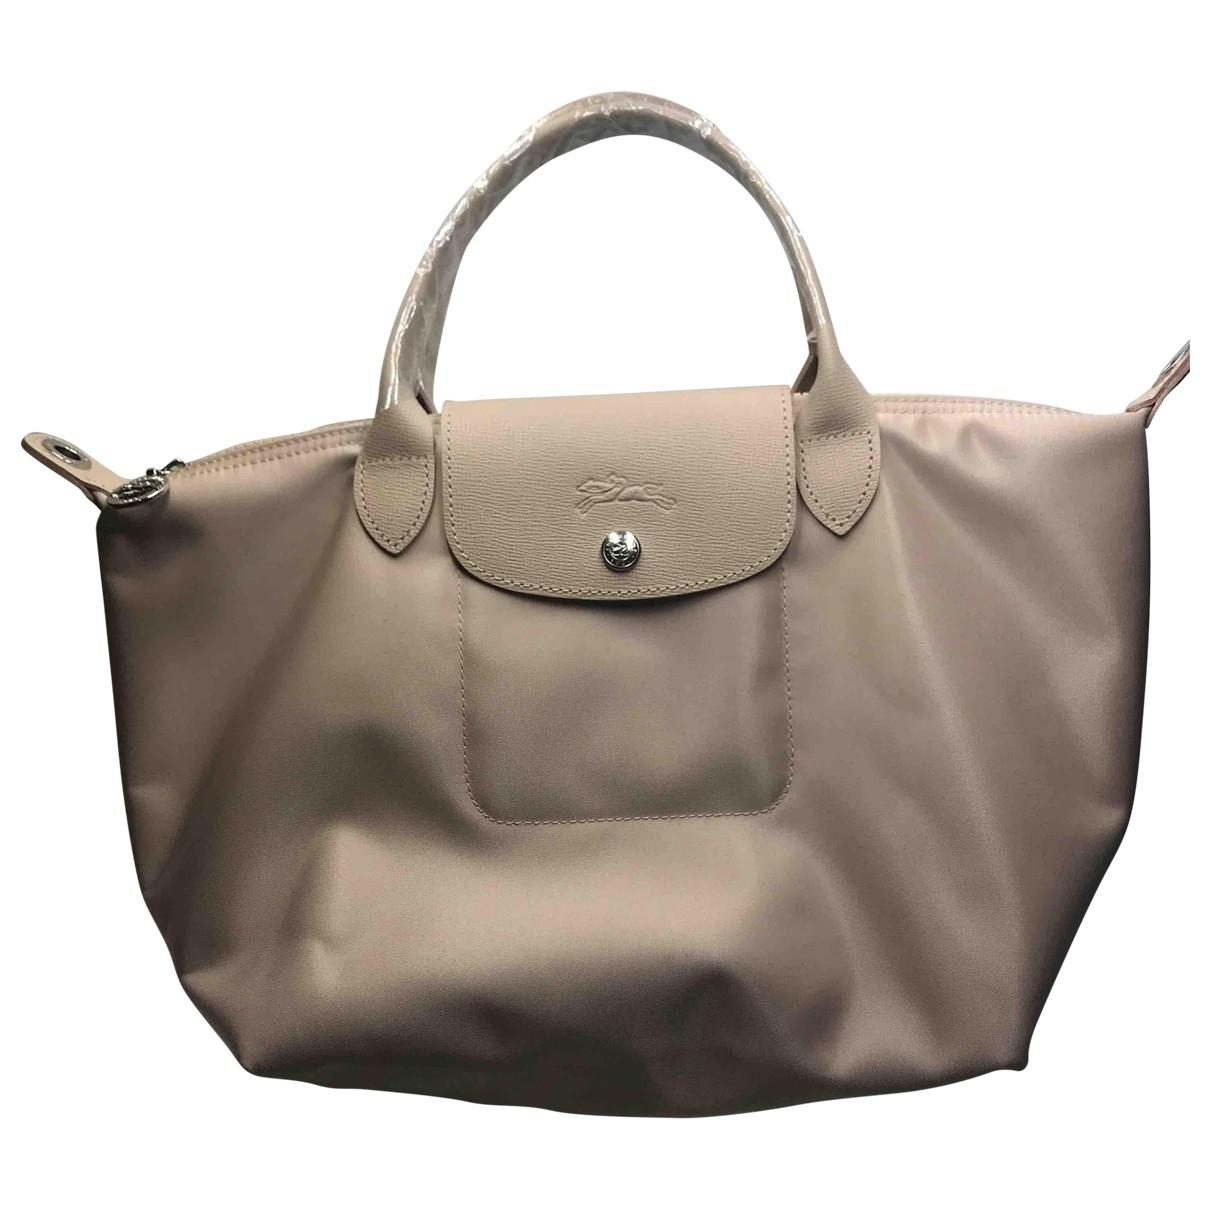 Longchamp Pliage  Handtasche in  Beige Leder